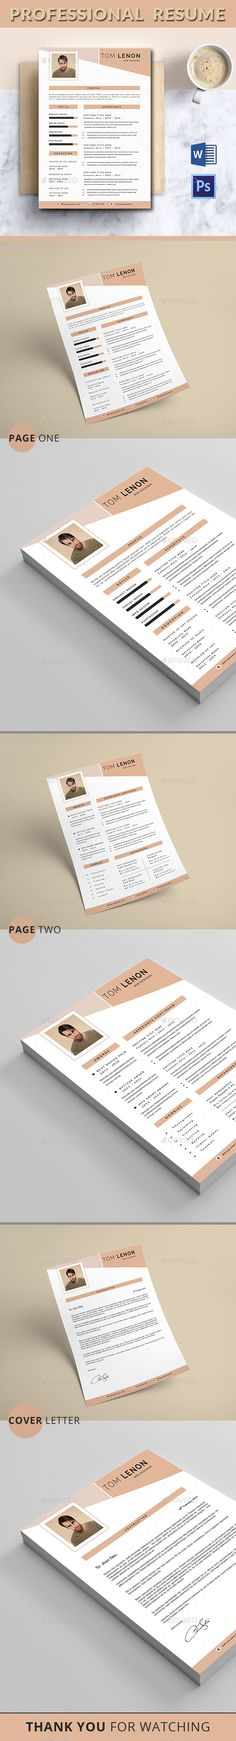 Professional #Resume - Resumes #Stationery